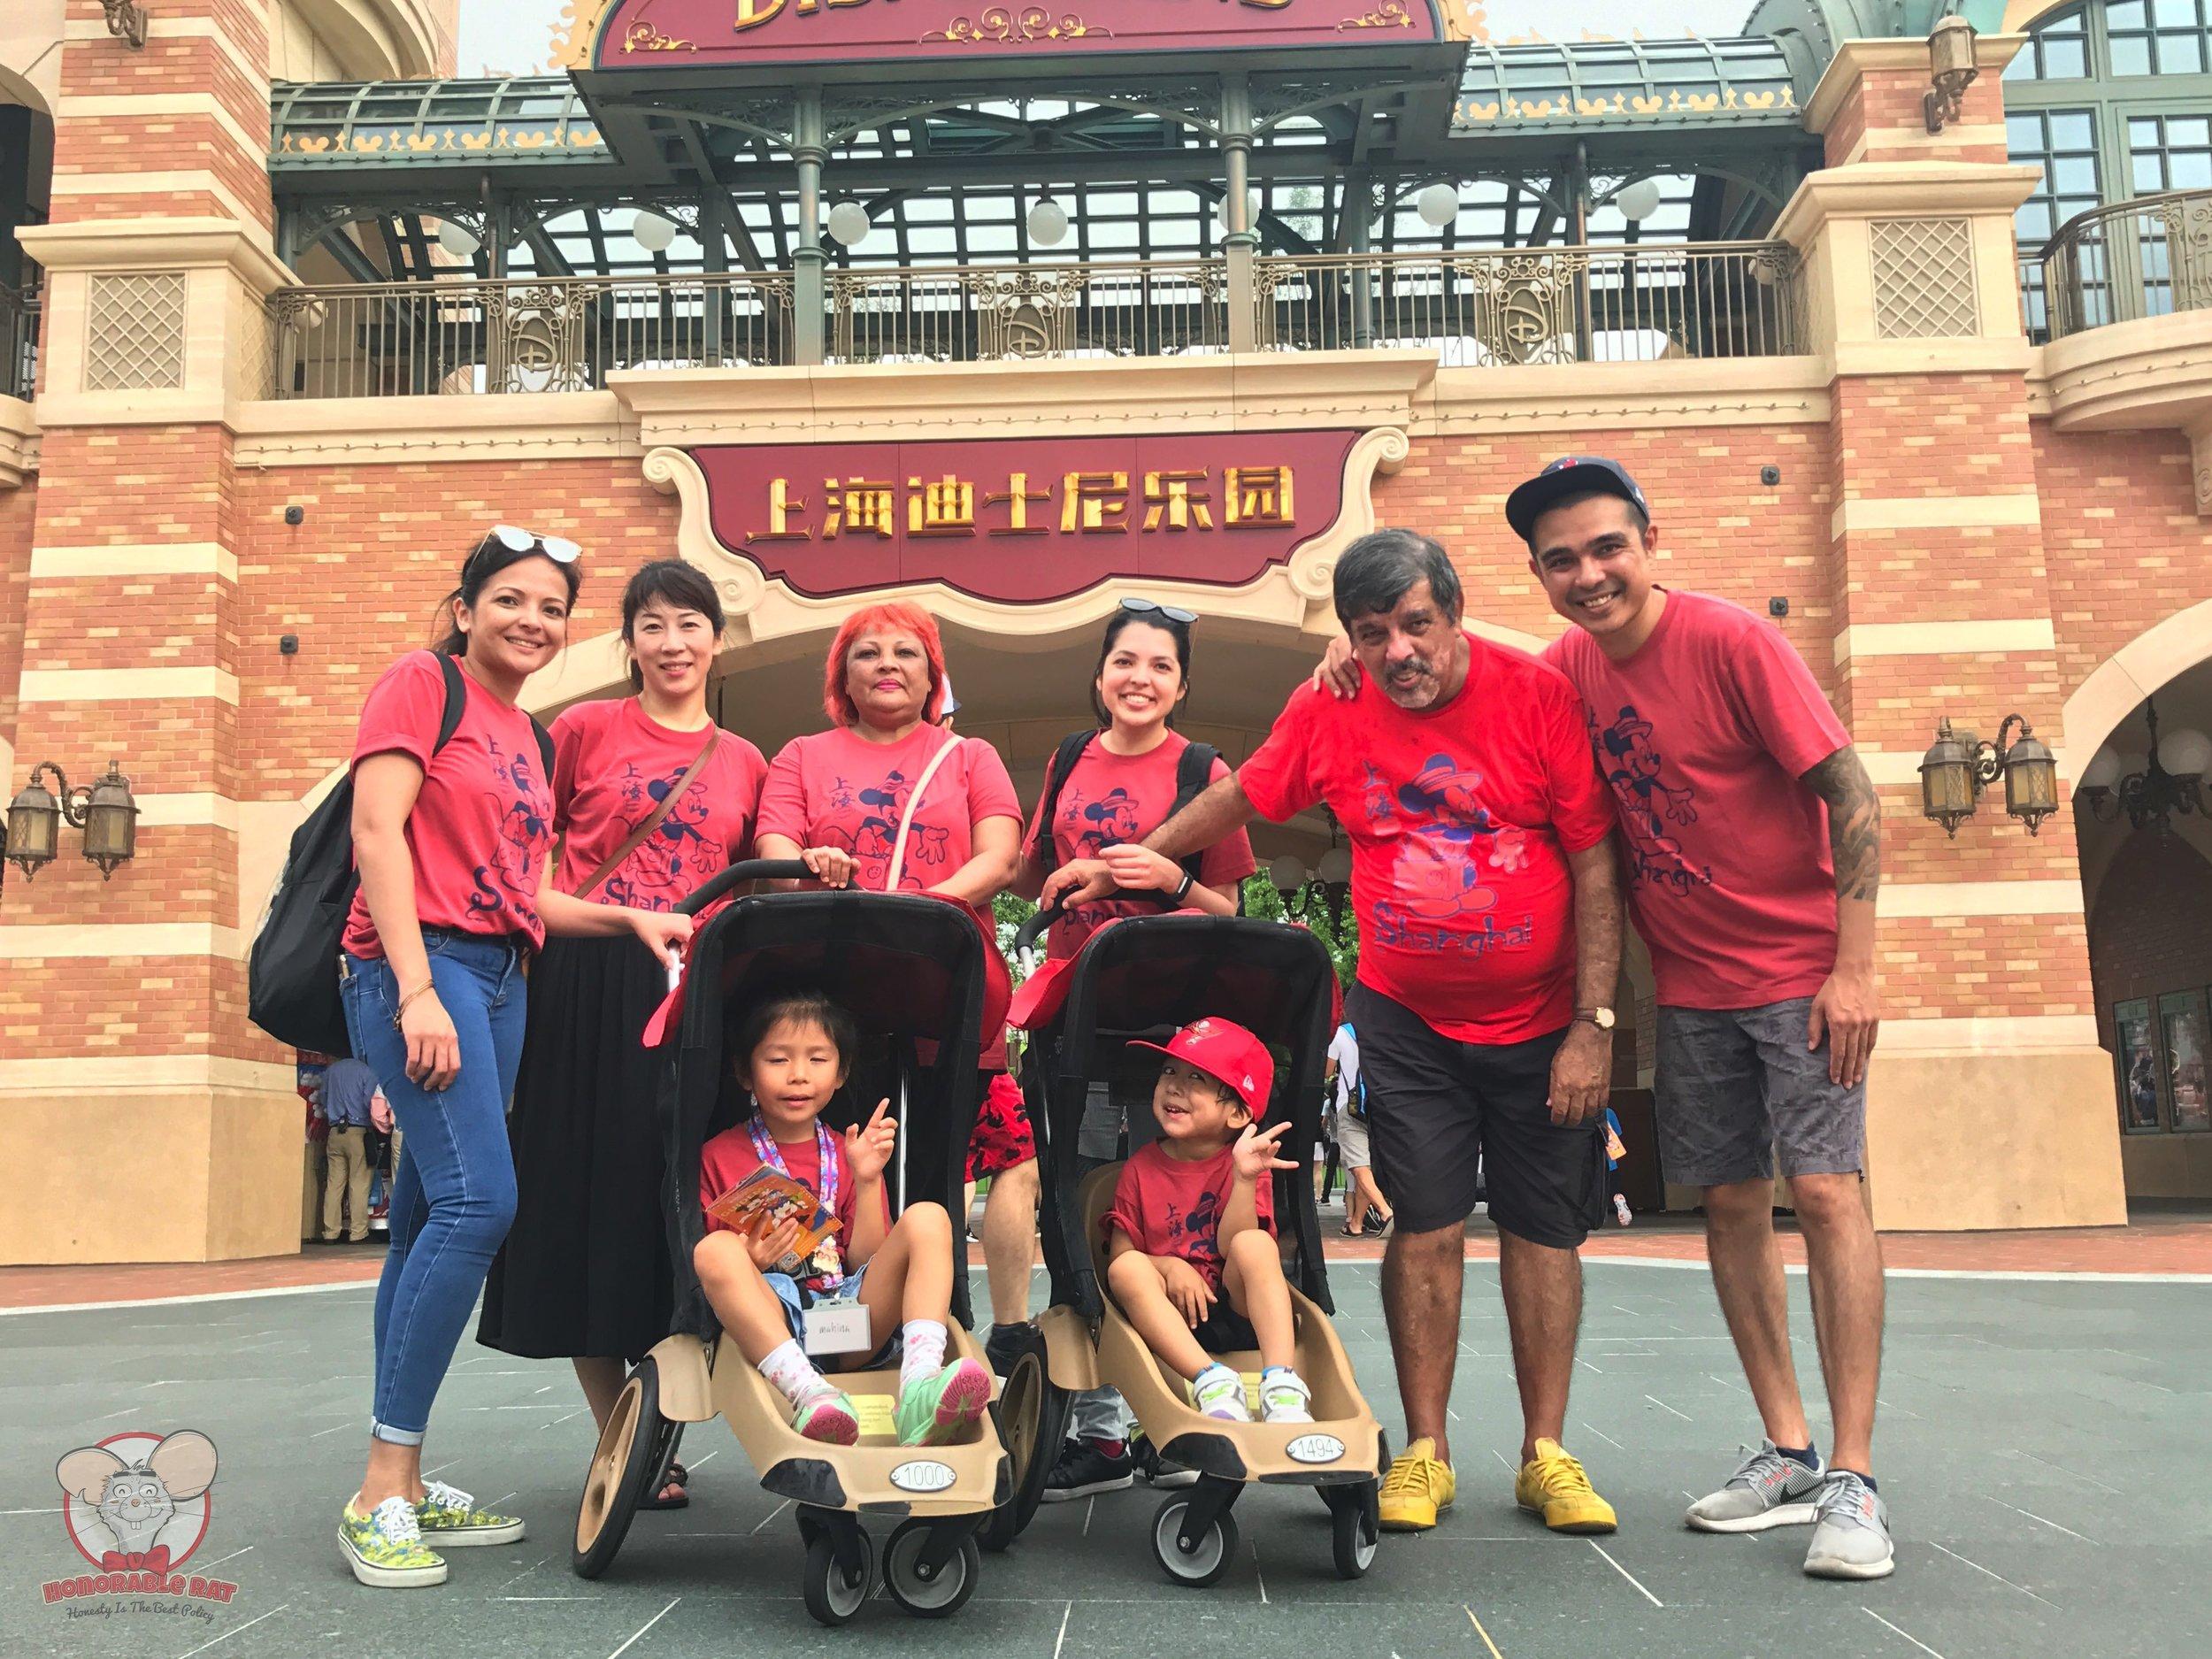 The Rat family in Shanghai Disneyland